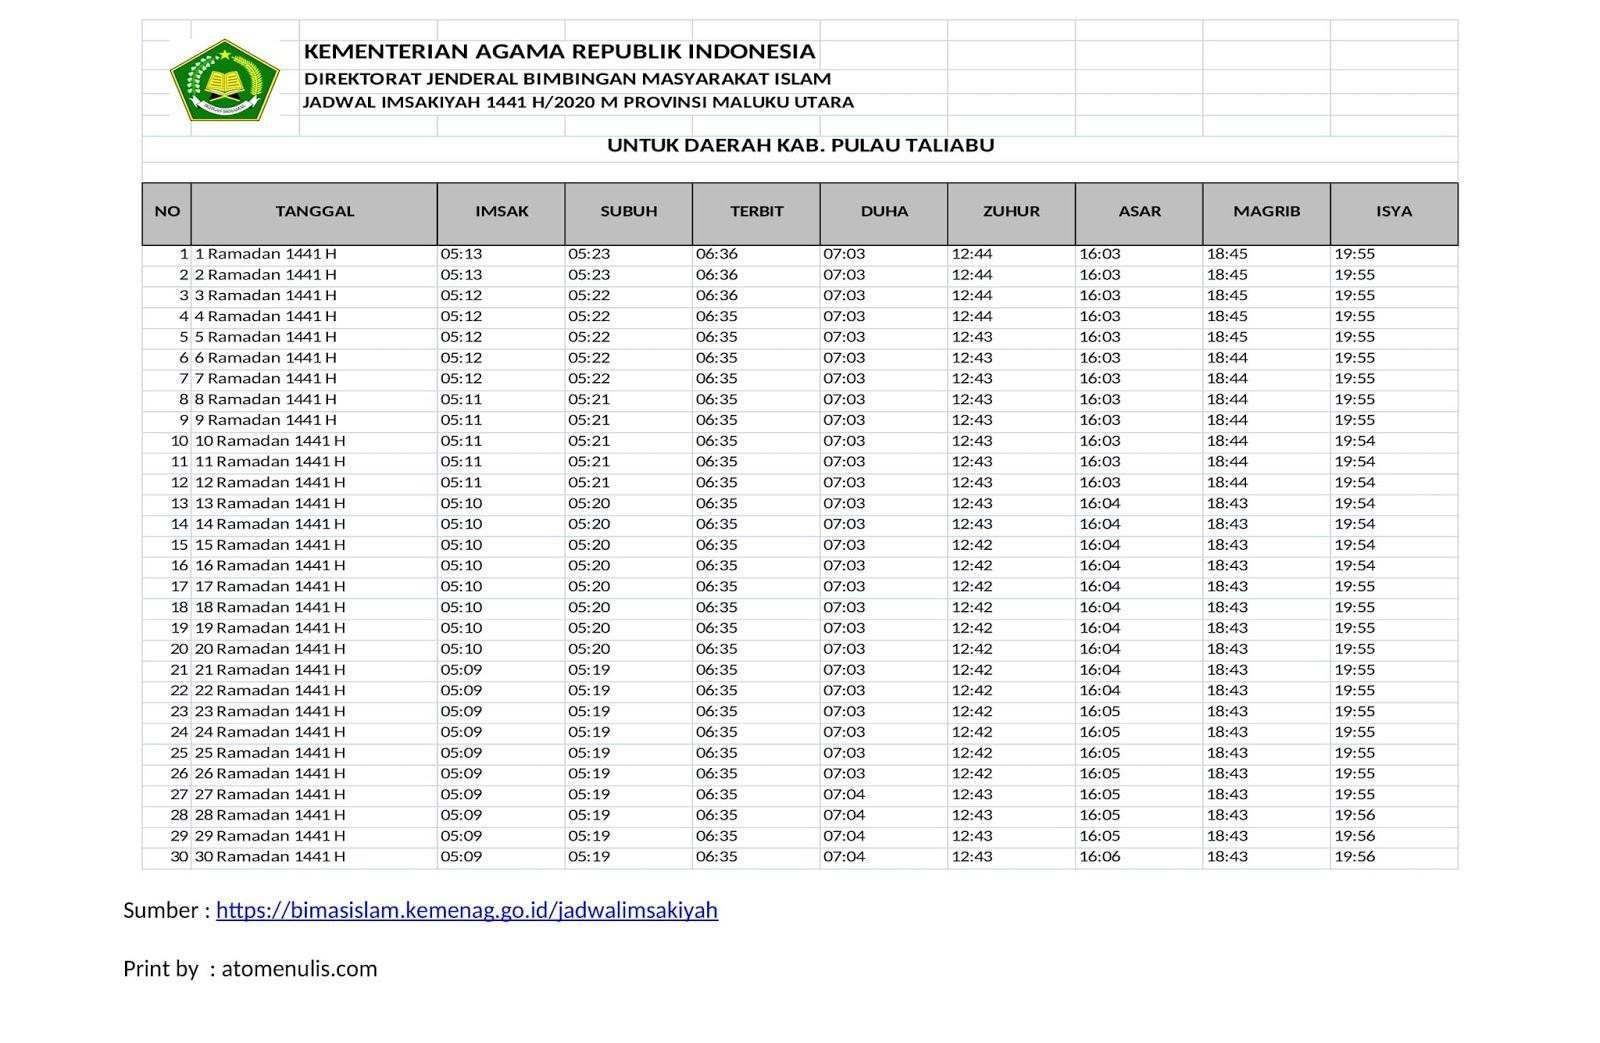 Jadwal Imsakiyah Pulau Taliabu 2020 dari KEMENAG - Ato Menulis